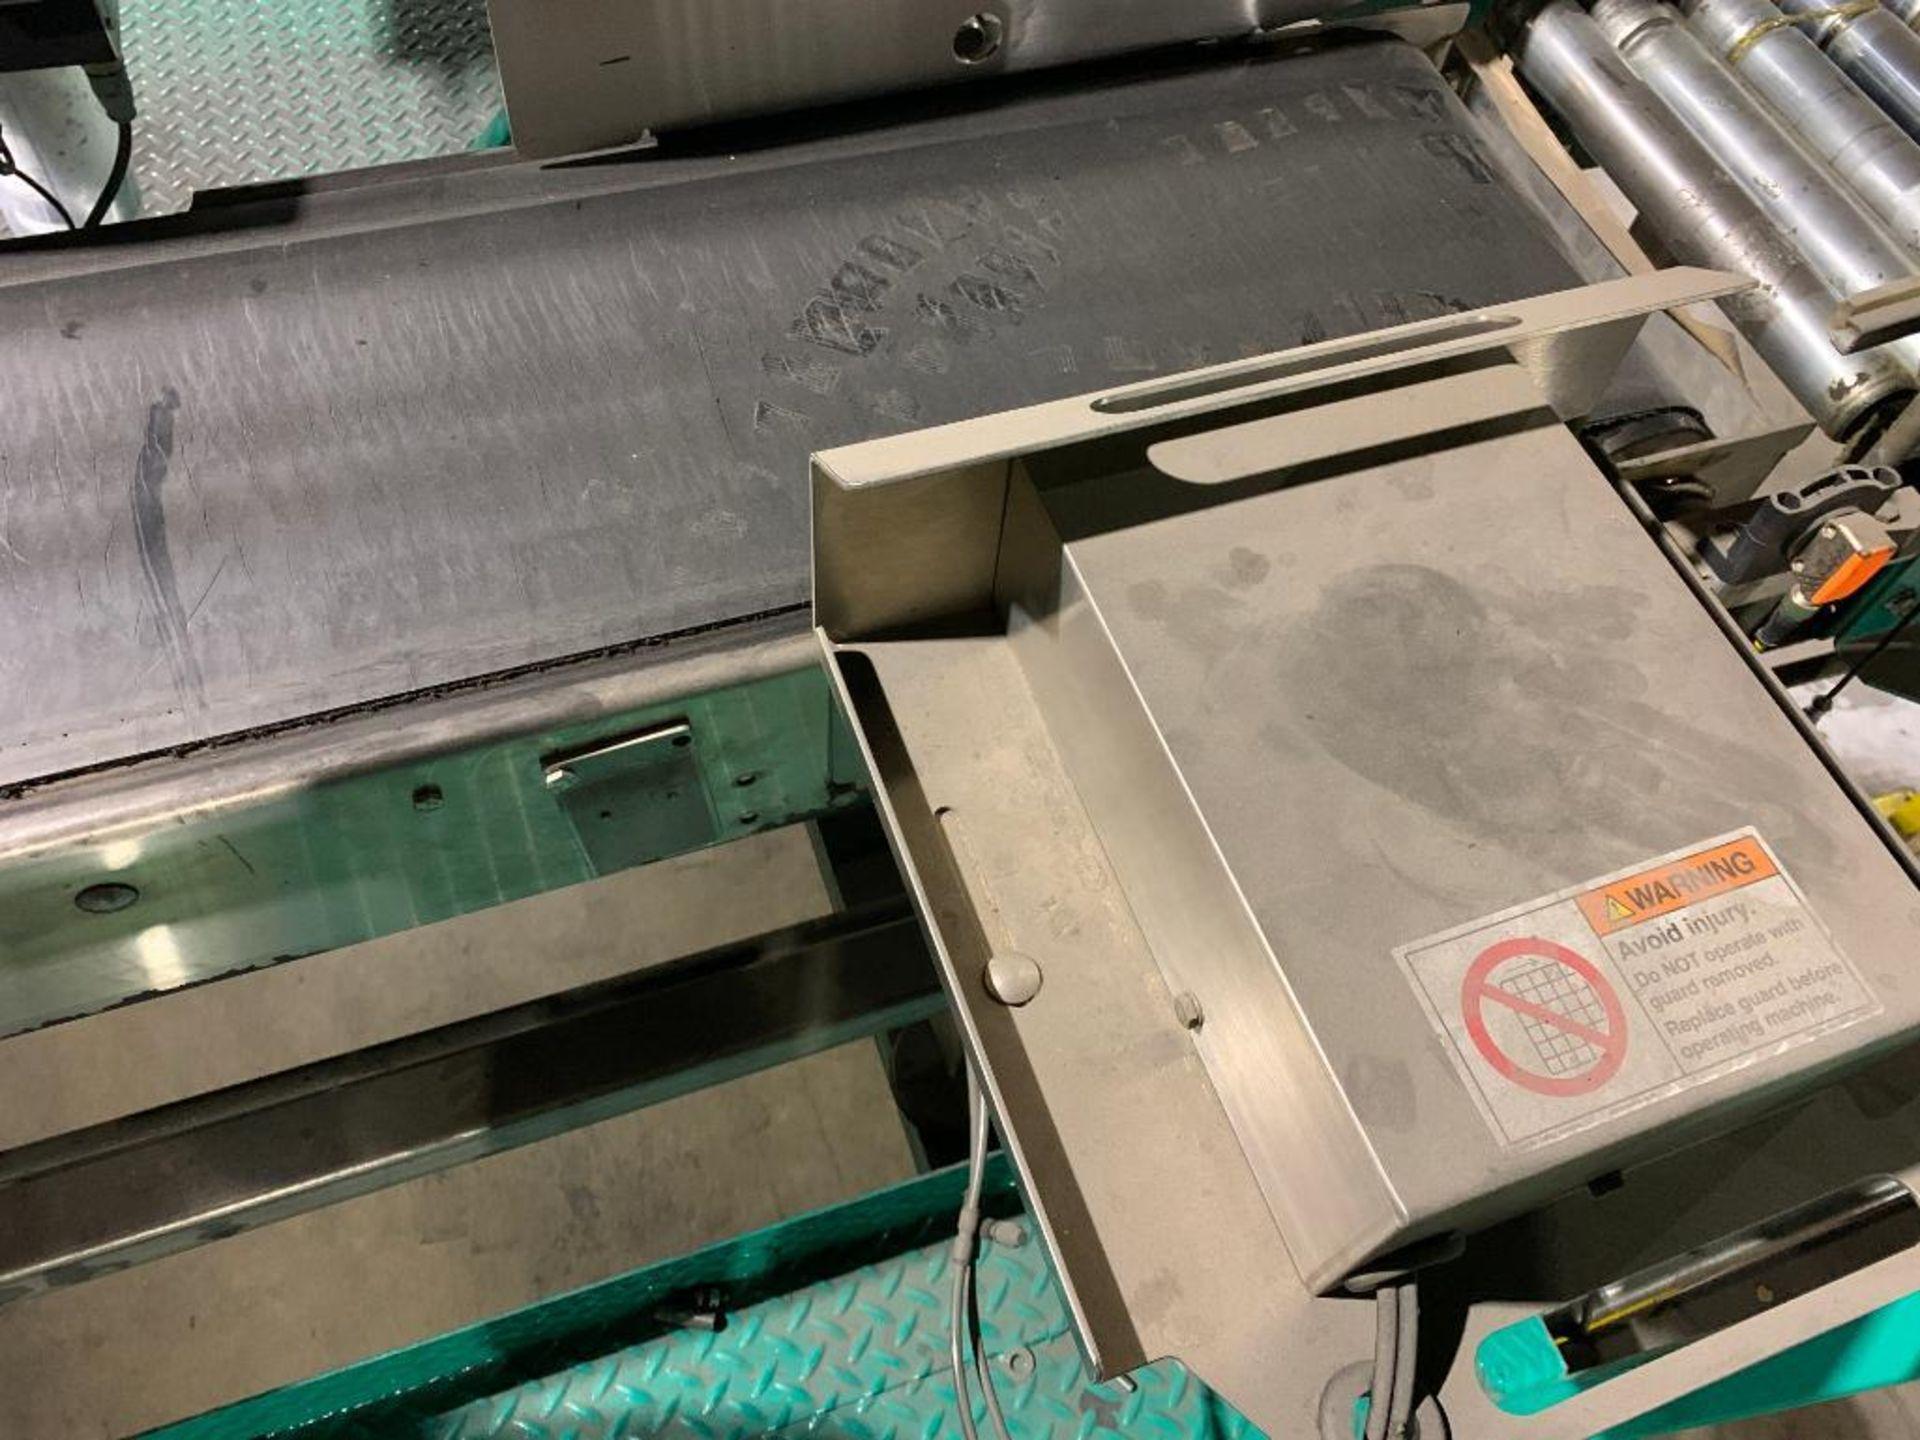 BMI stainless steel conveyor - Image 11 of 14